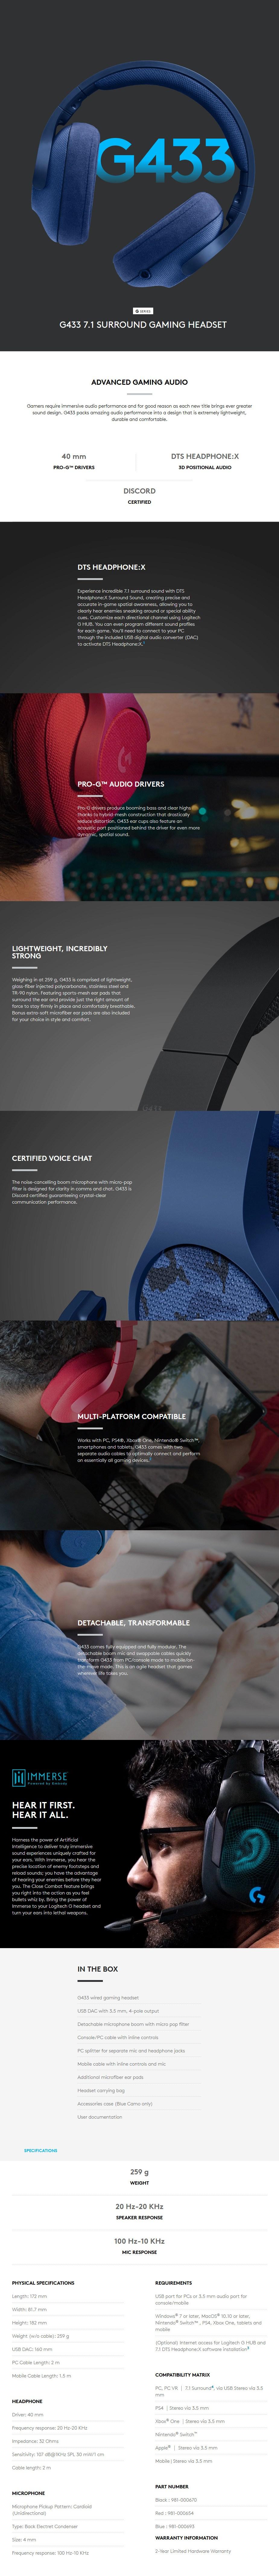 logitech-g433-71-surround-wired-gaming-headset-red-ac36762-6.jpg